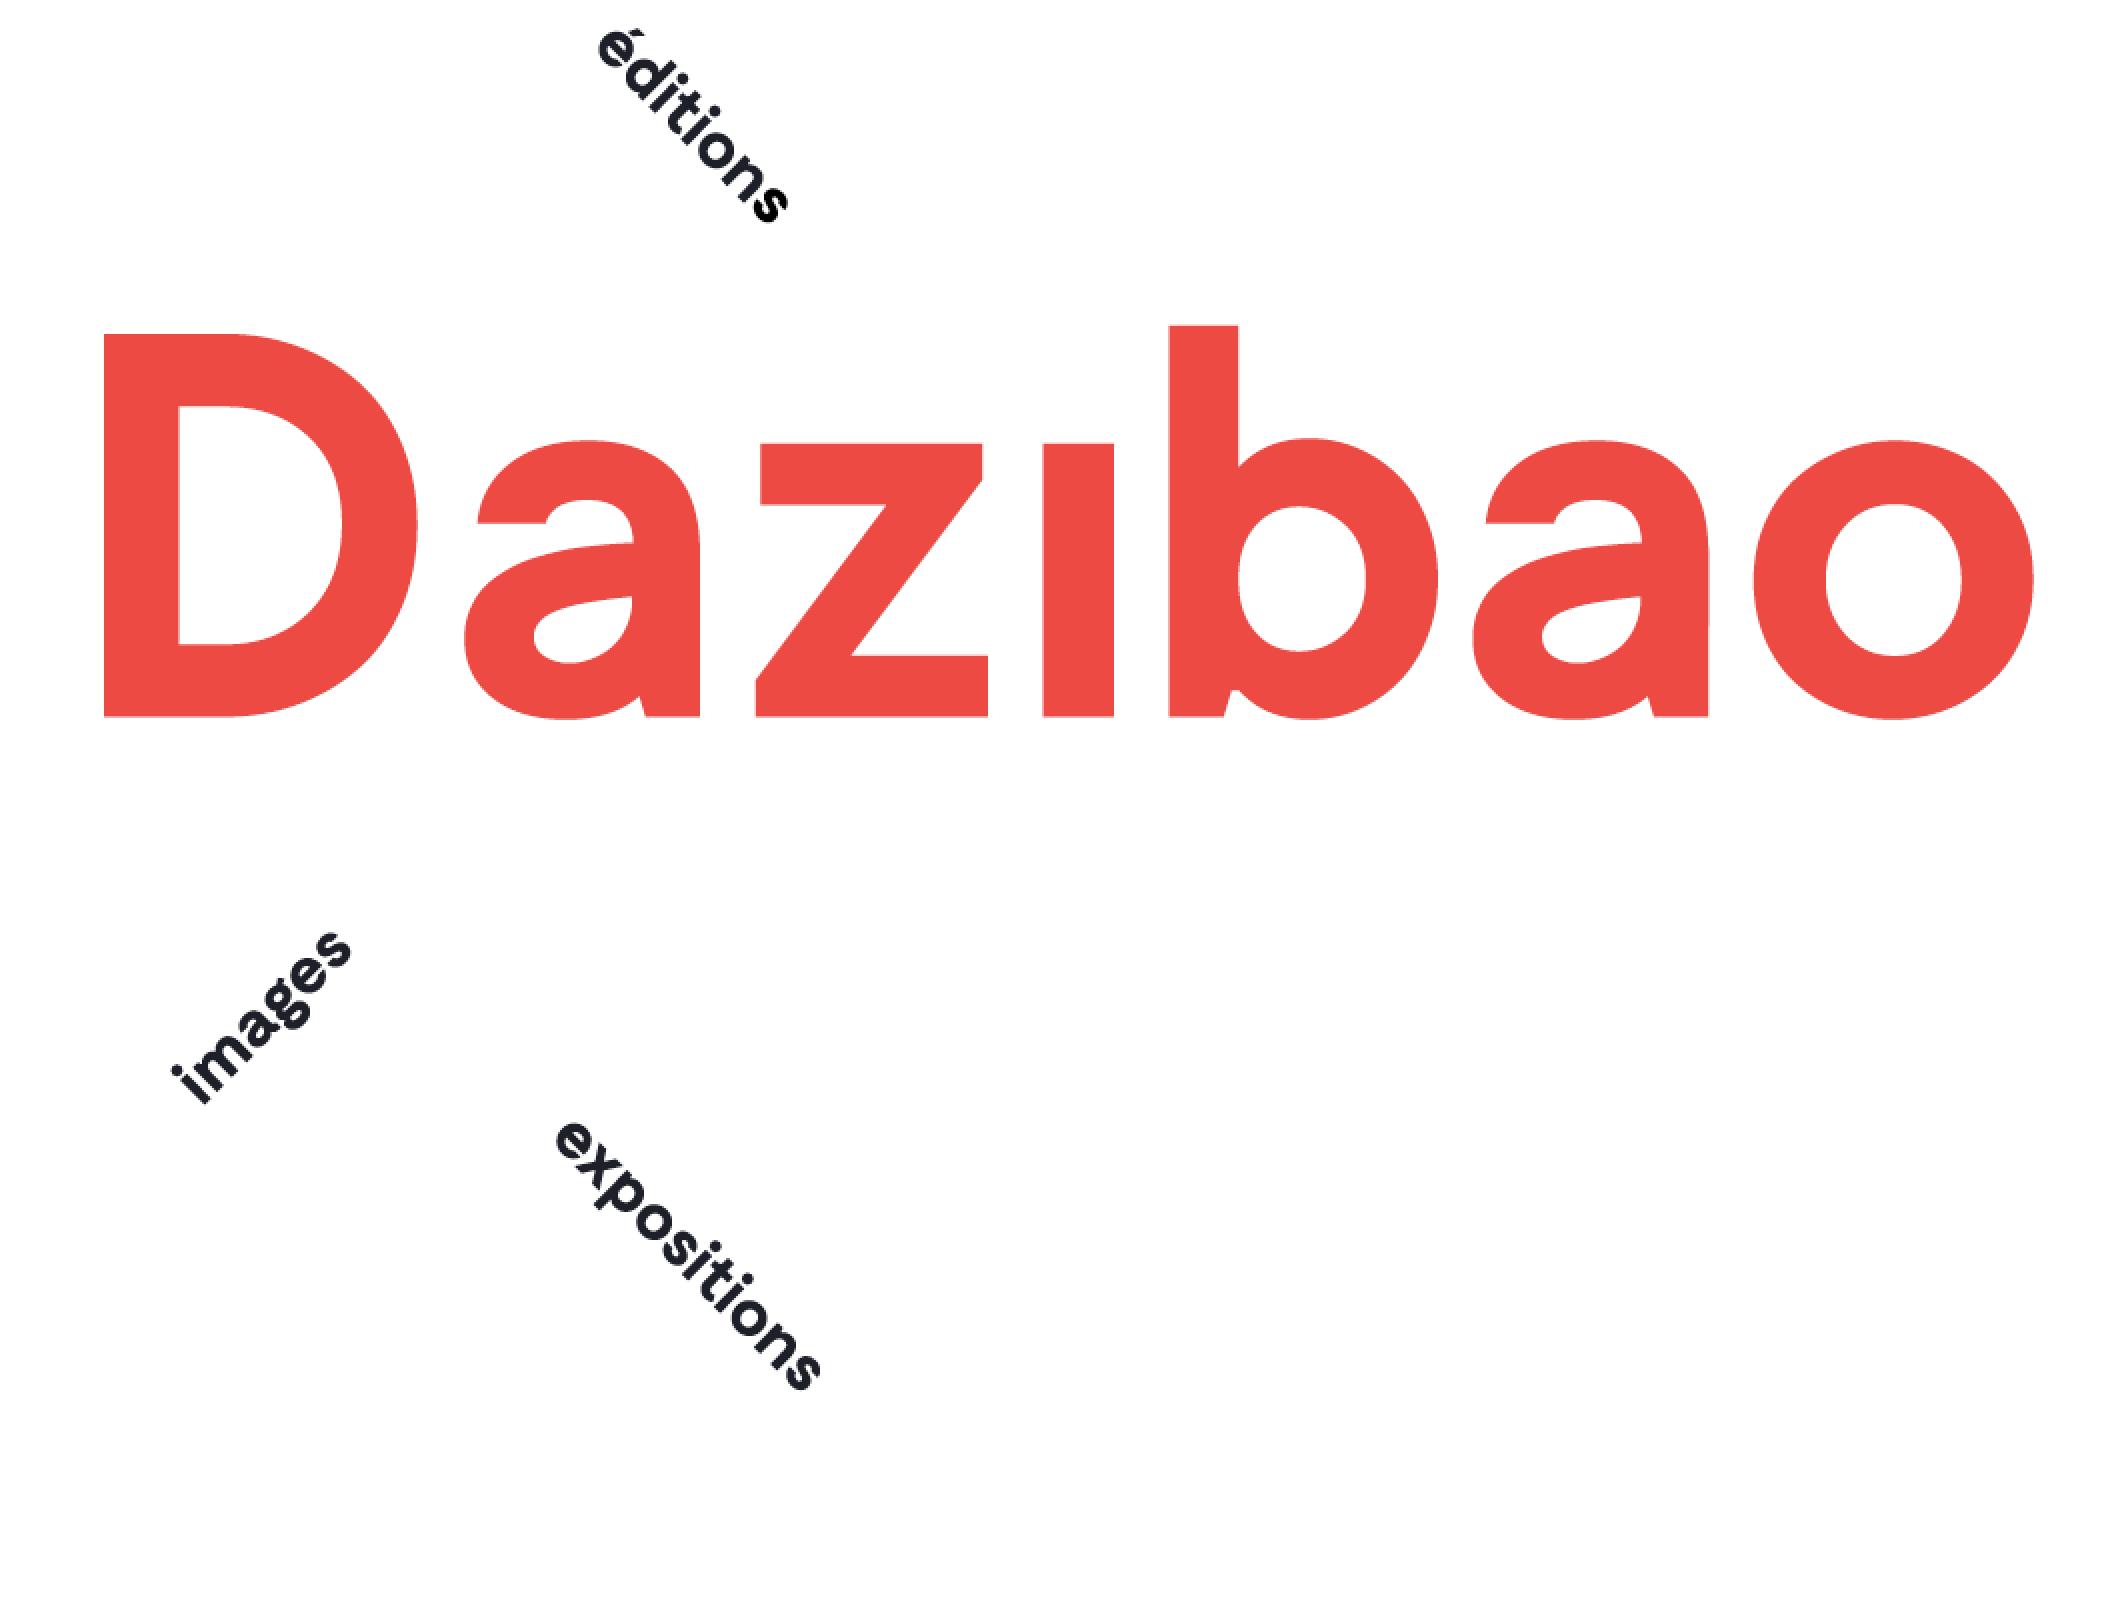 logo texte 2.png